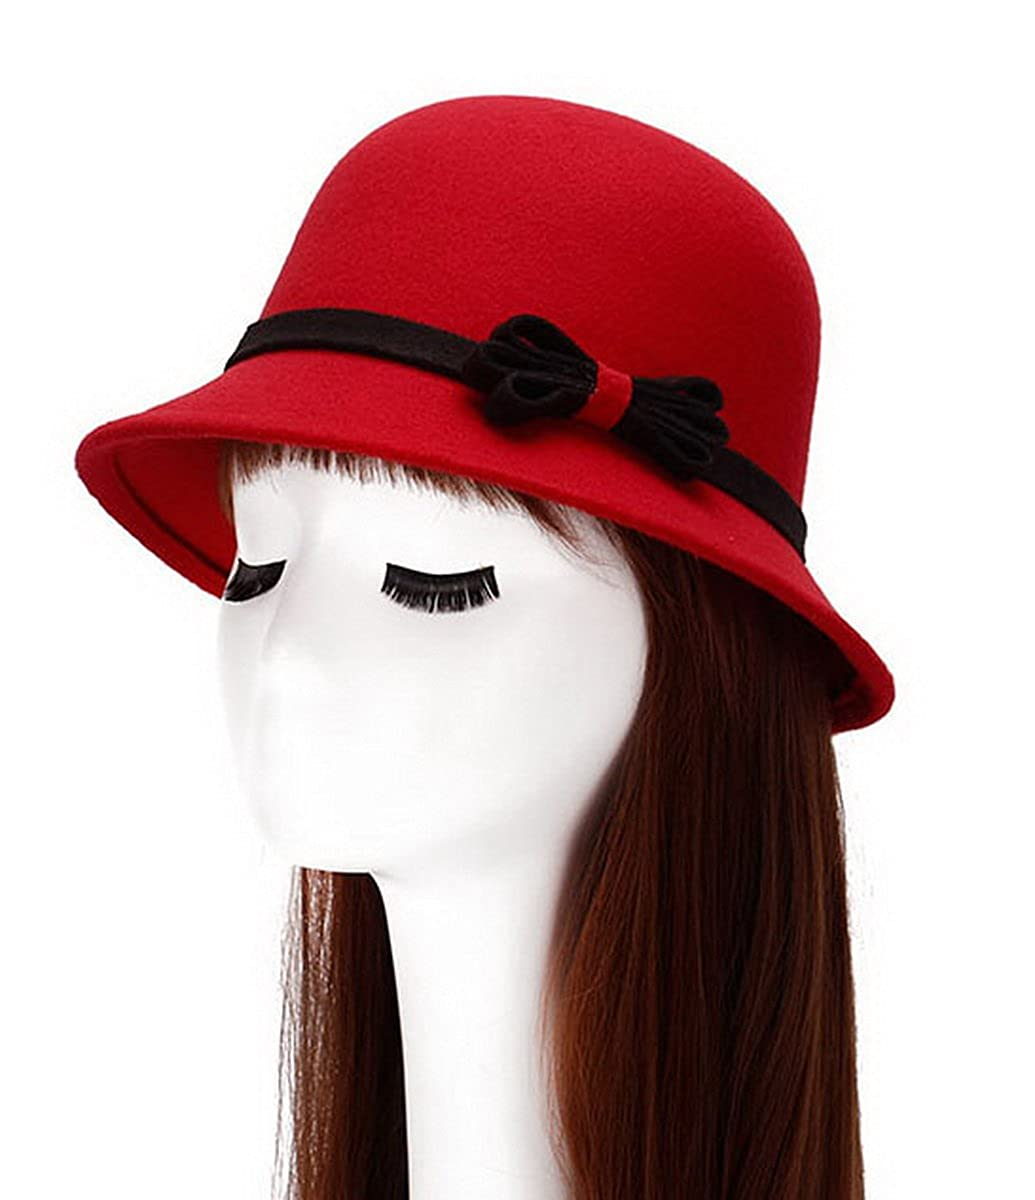 Brcus Women Wool Felt Church Cloche Cap Bucket Bowler Hat Cap W/Bowknot Band